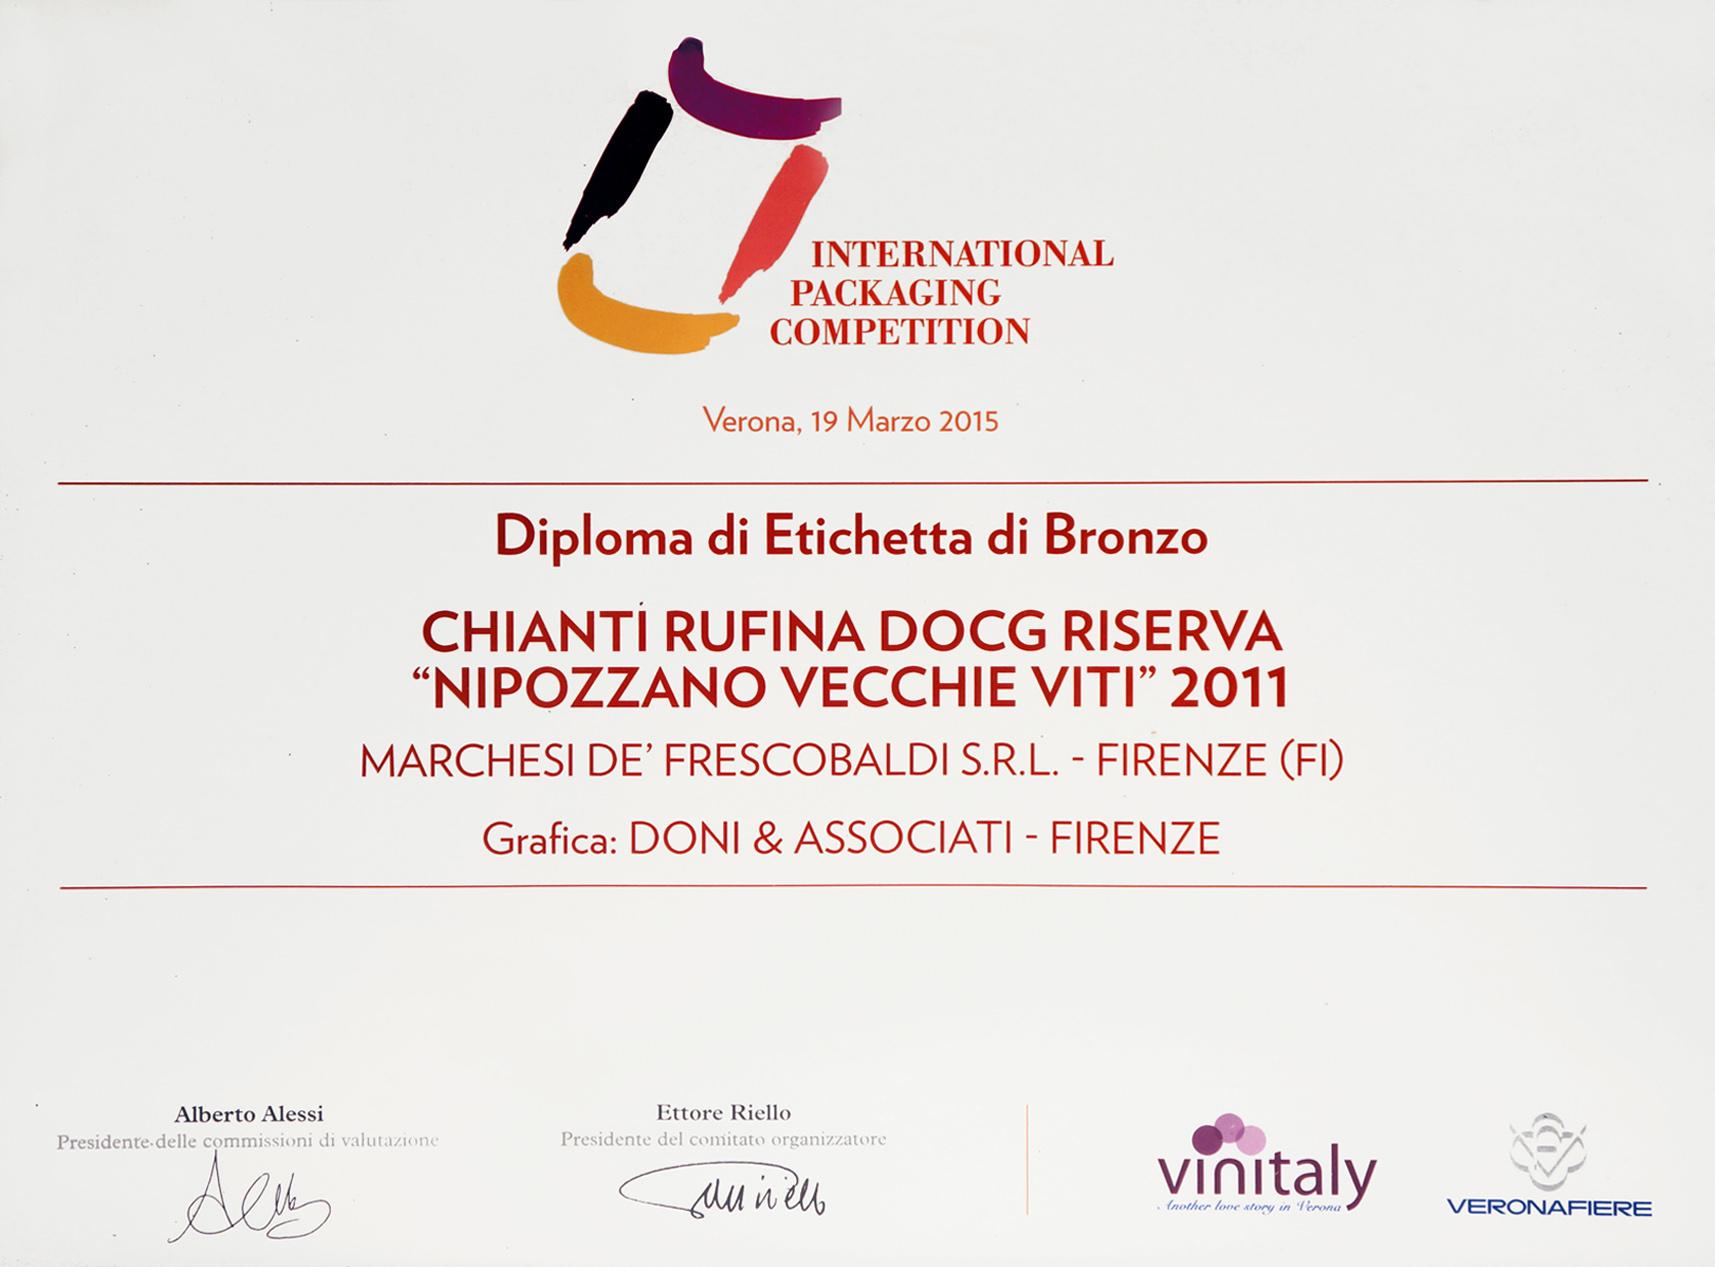 doni-etichetta-bronzo-frescobaldi-vinitaly-2015